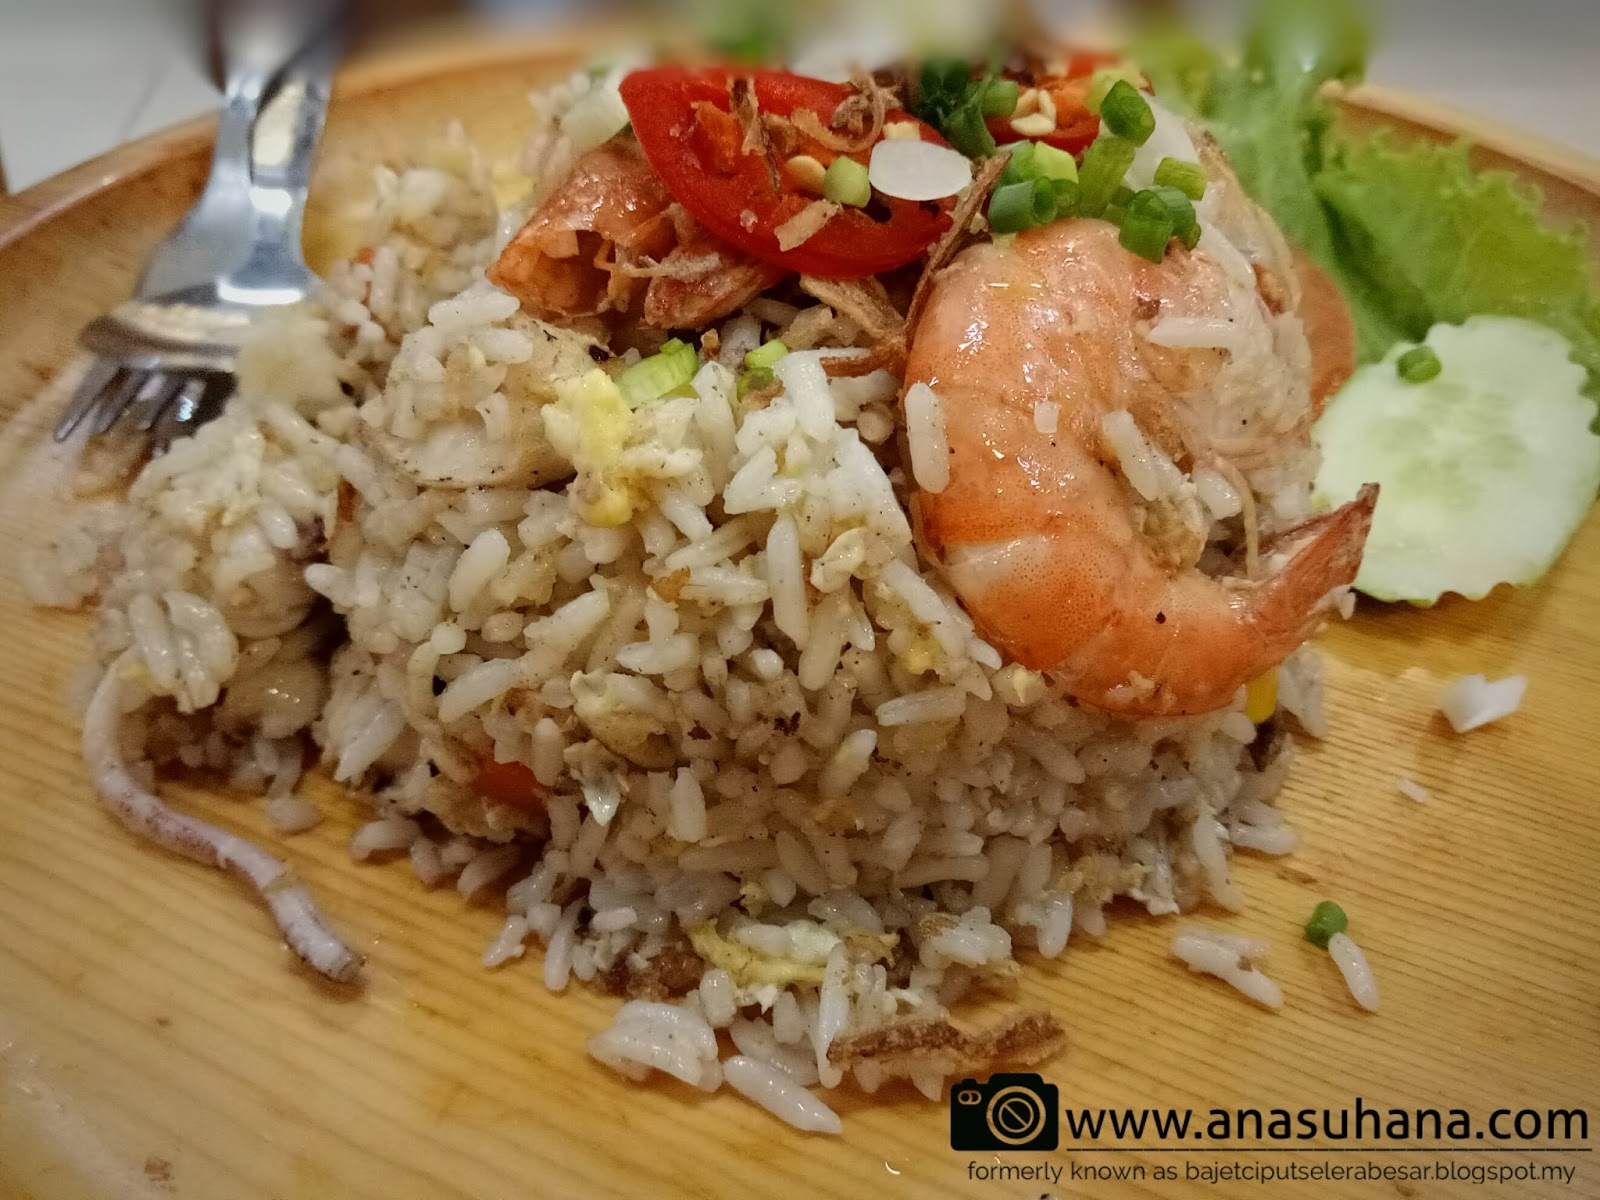 Kafe Restu Resipi, Kafe Wajib Singgah di Kenanga Wholesale City